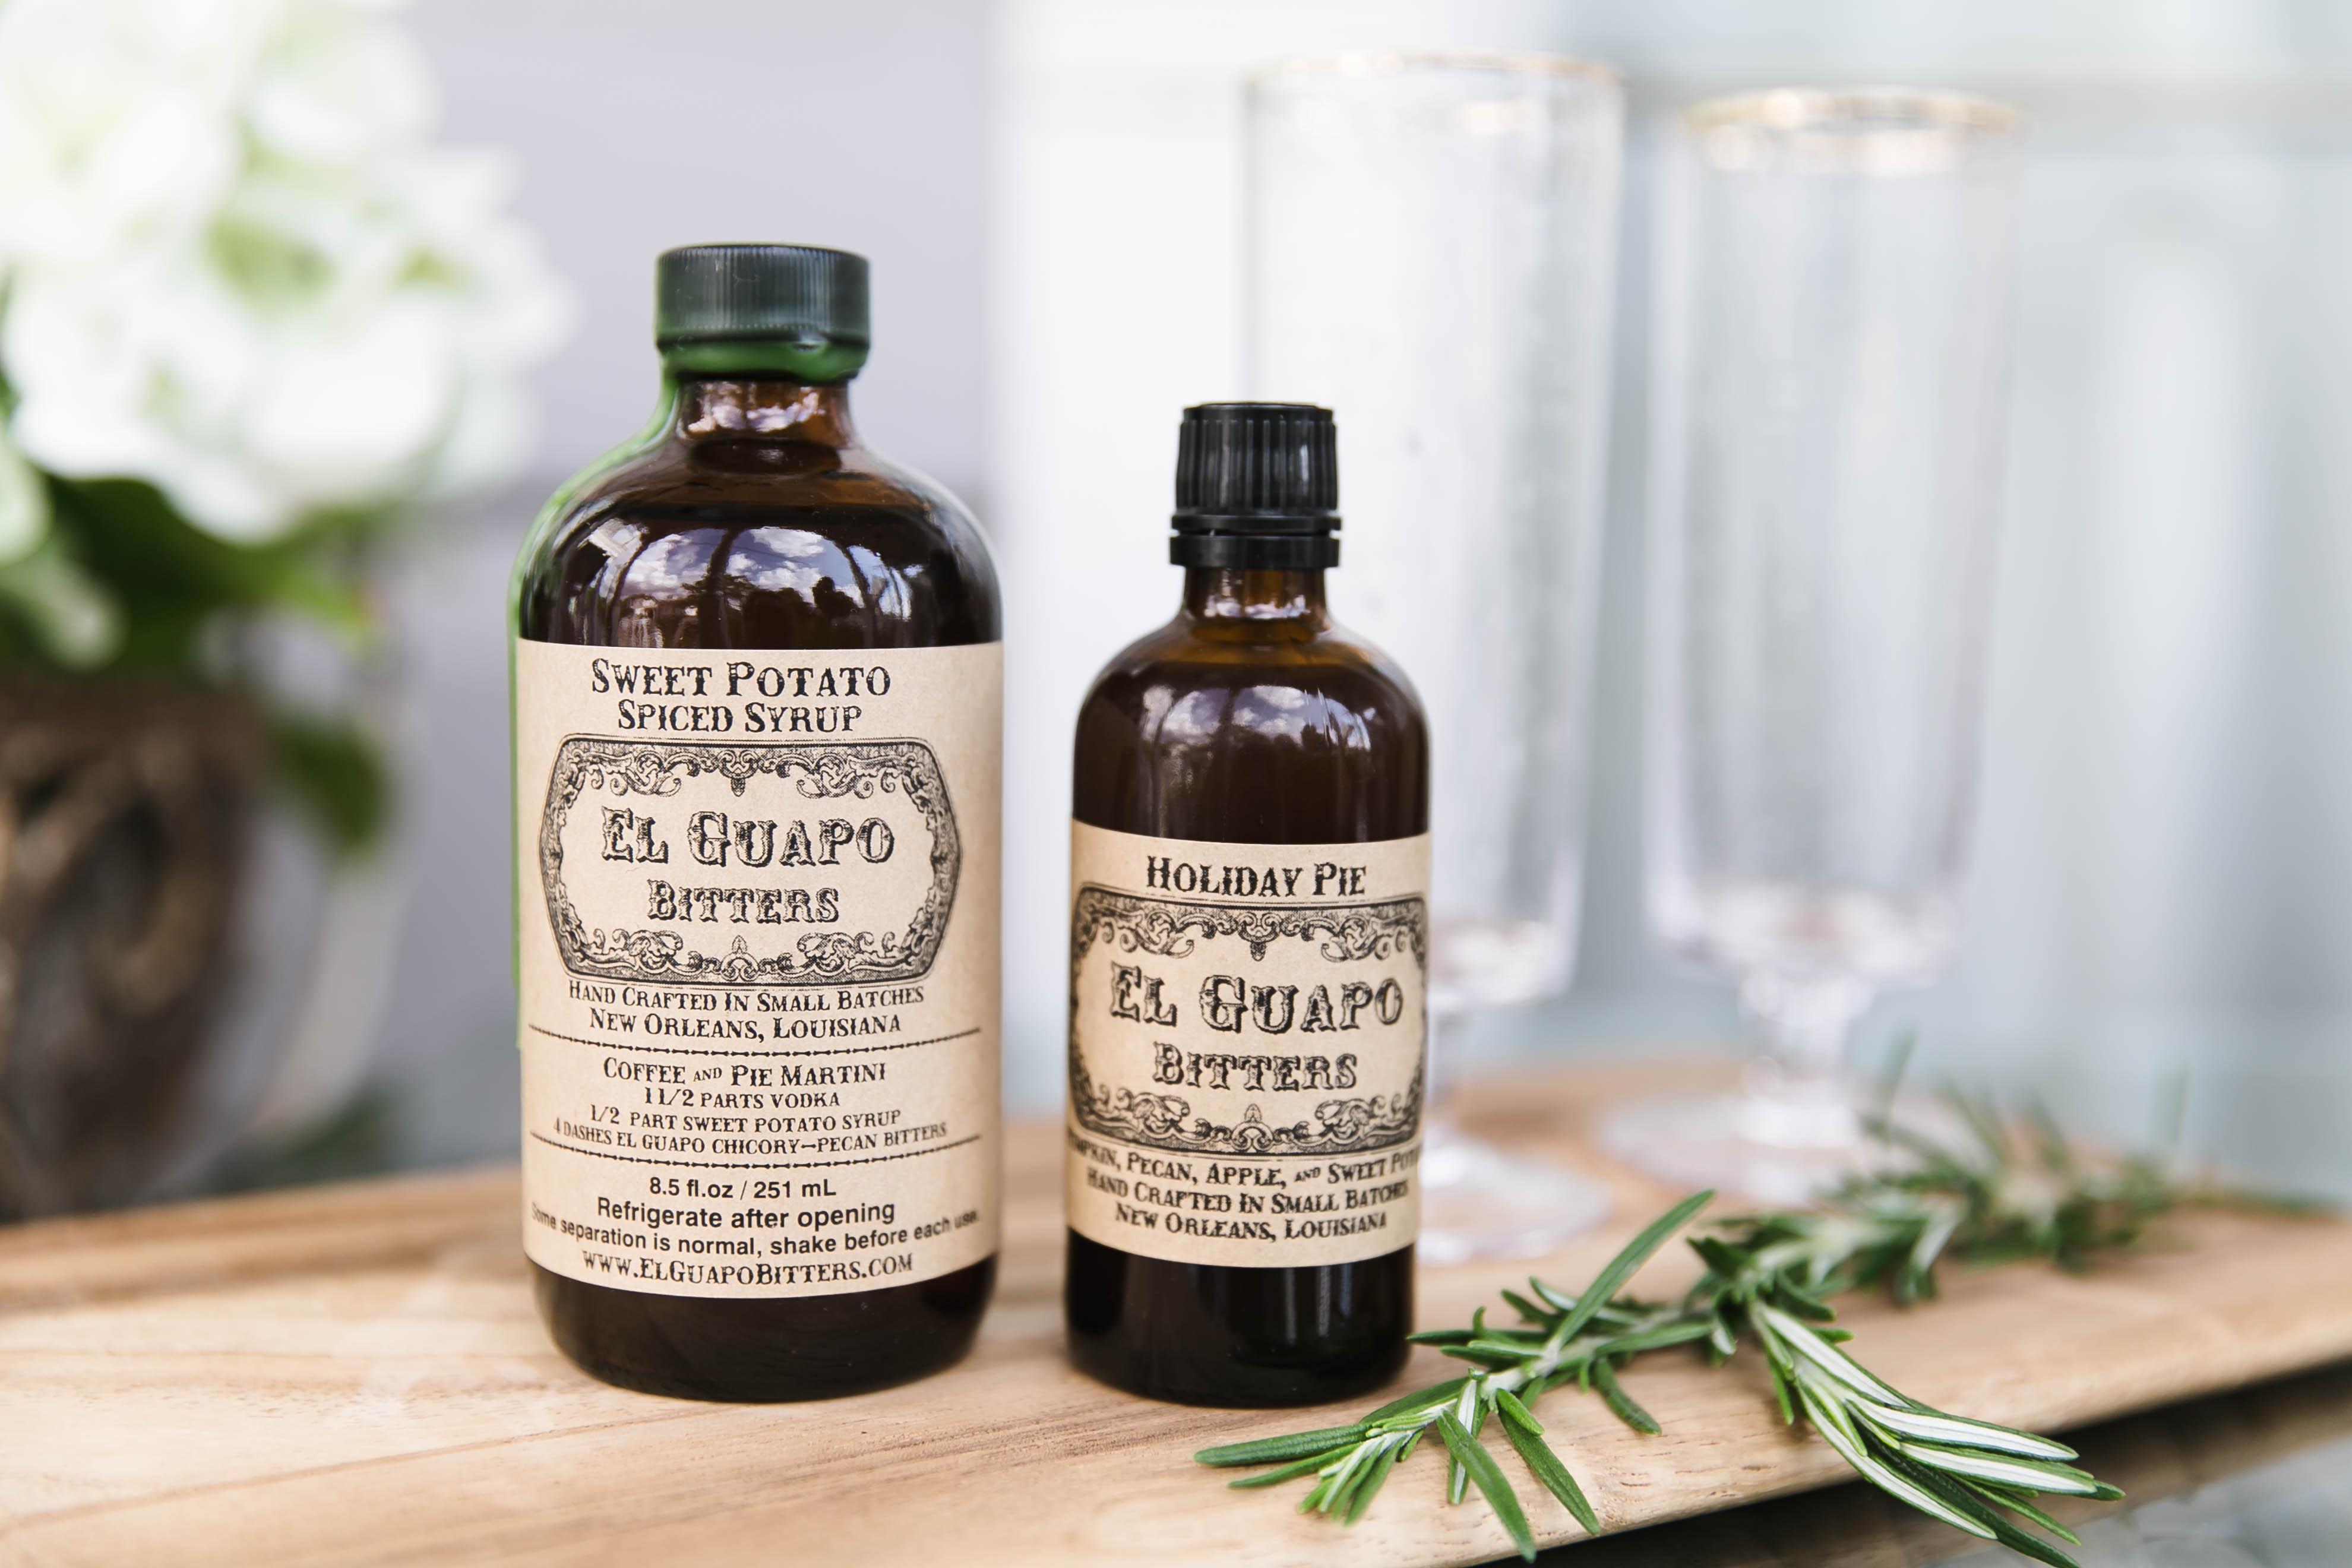 El Guapo Bitters & Syrups